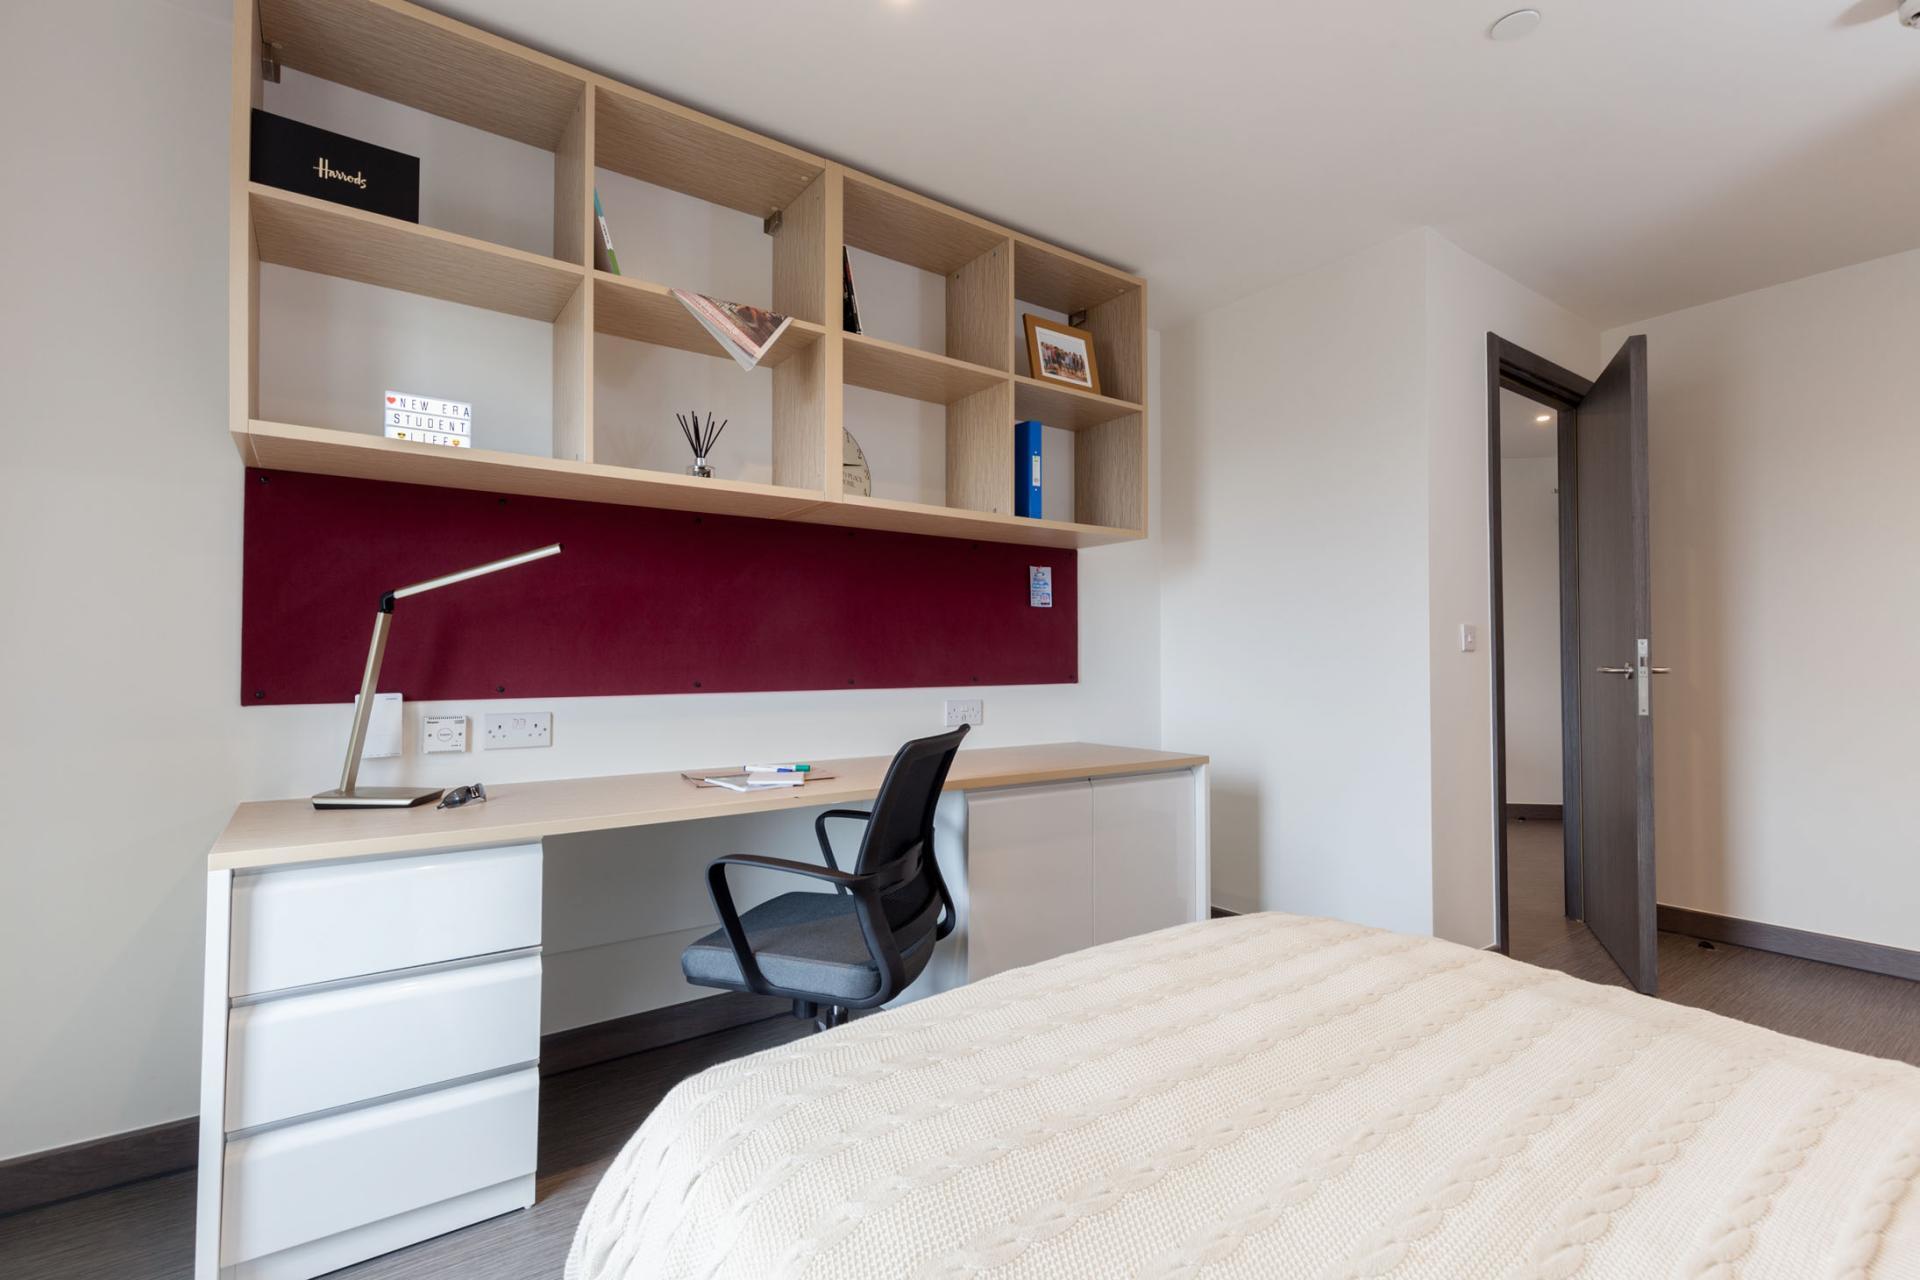 One Bedroom Apartment (Large - £190 per week)